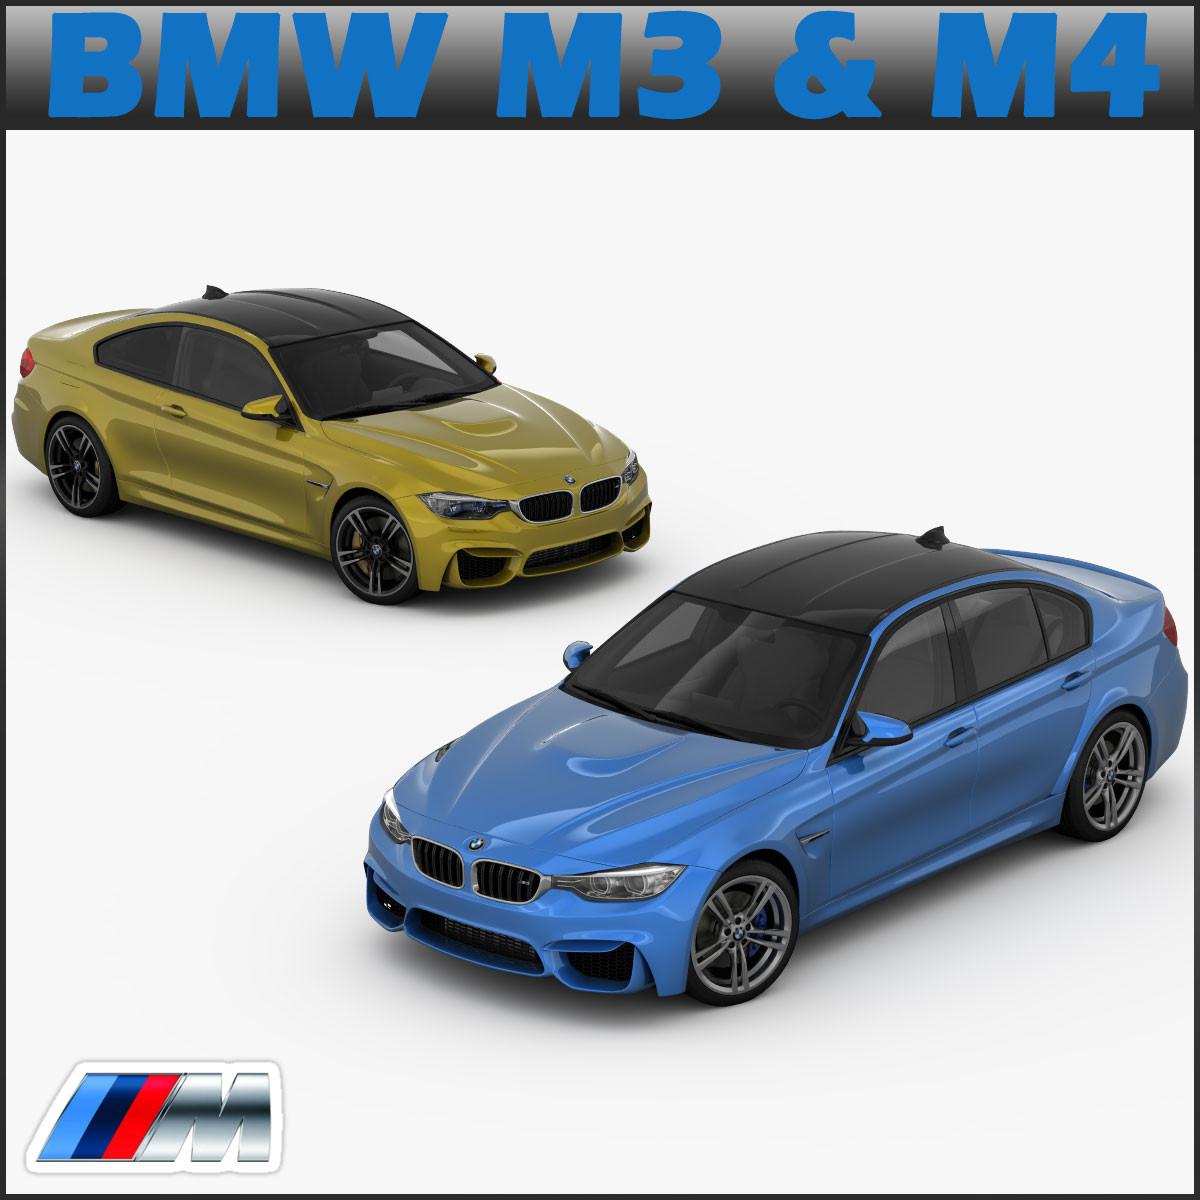 BMW-M3-M4-01.jpg